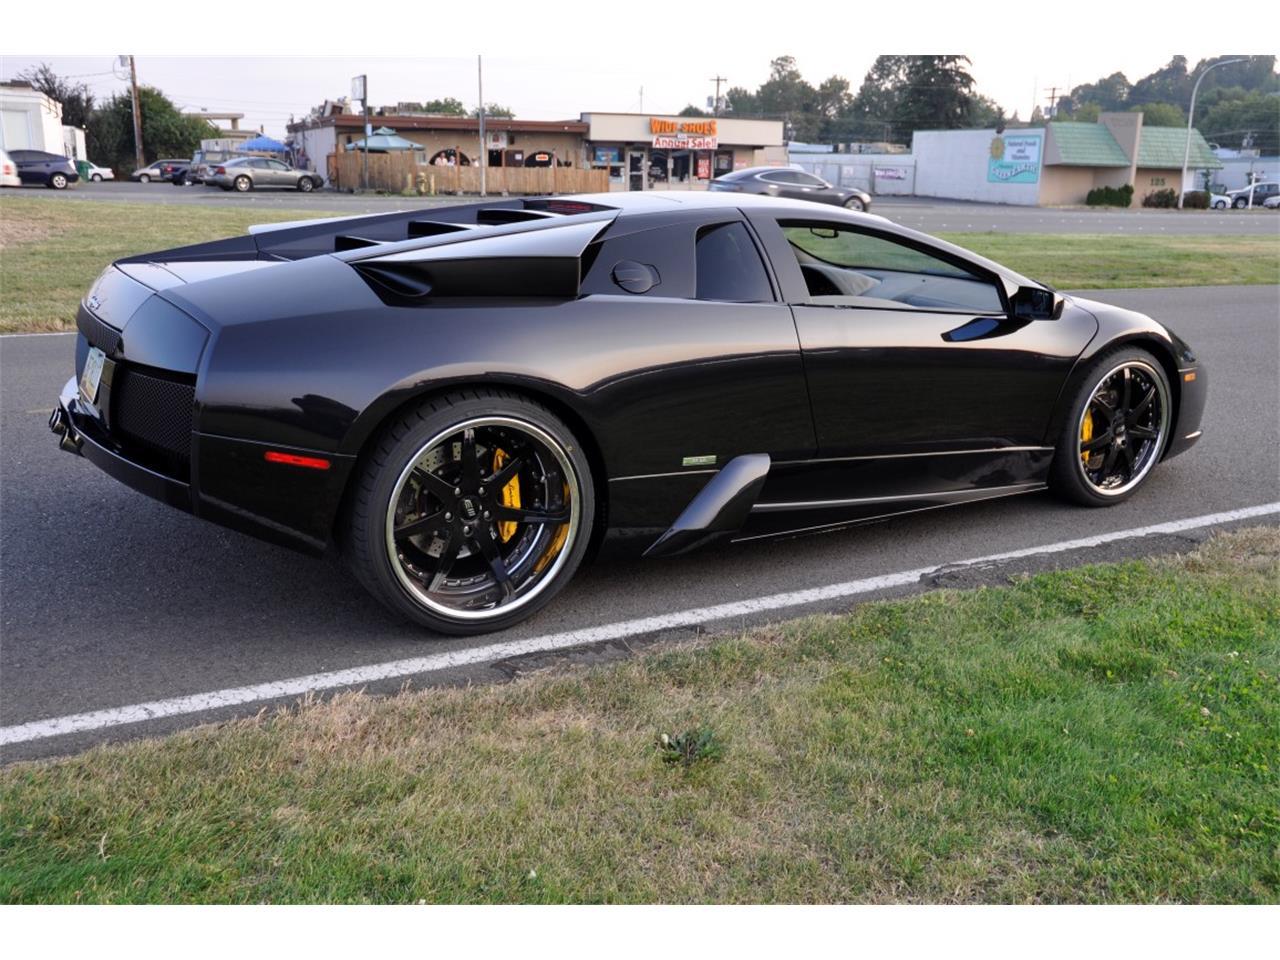 2002 Lamborghini Murcielago For Sale Classiccars Com Cc 1136068